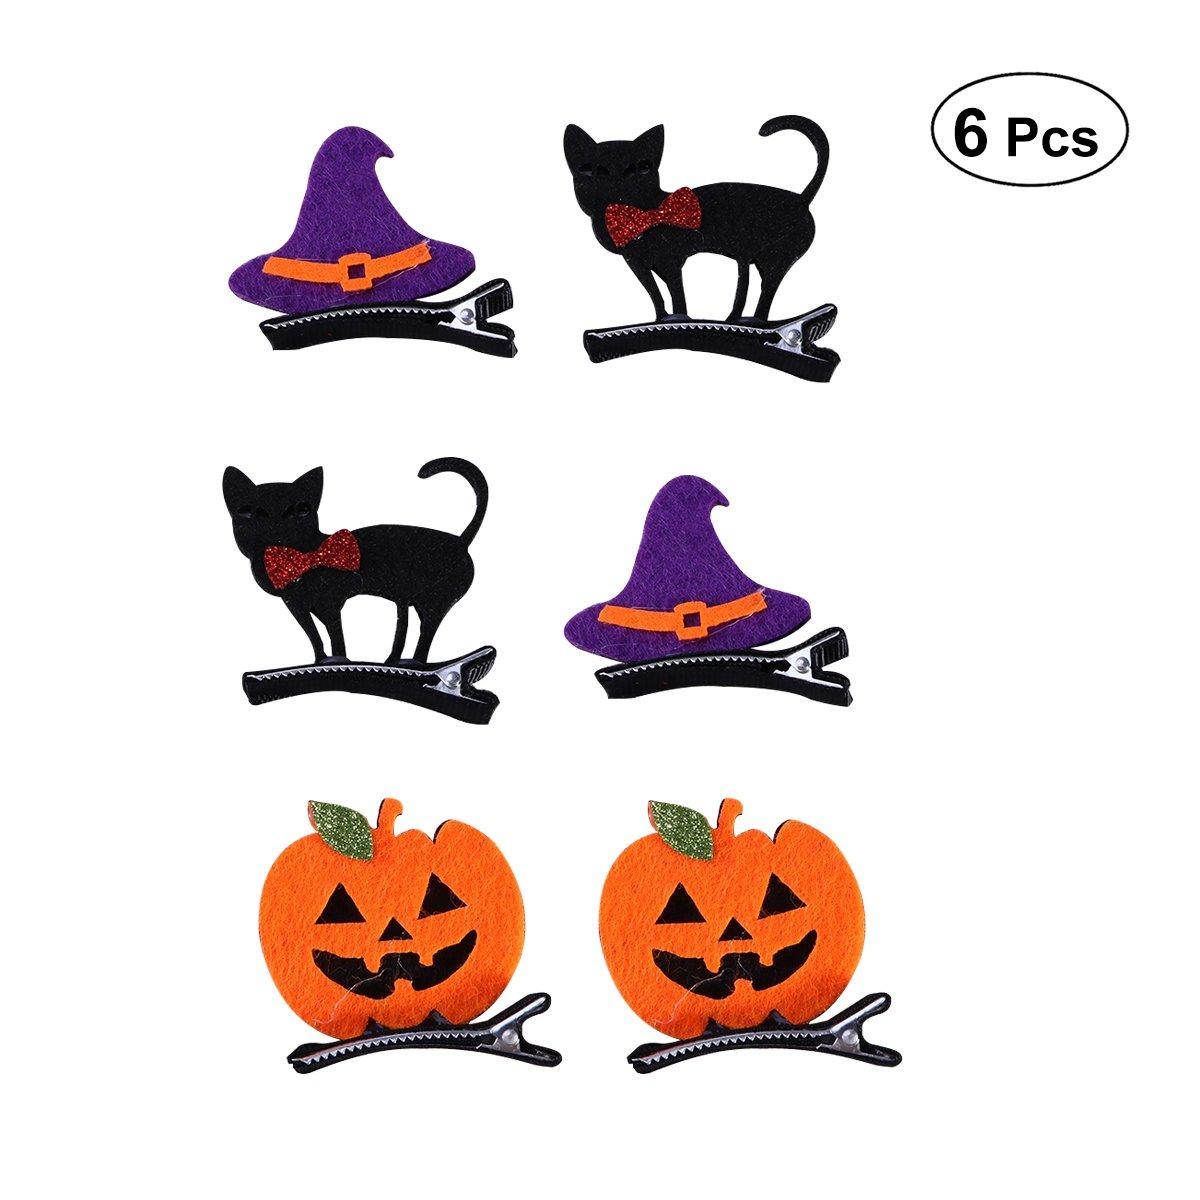 Amazon.com: Frcolor 6Pcs Halloween Hair Clips Hair Pins ...